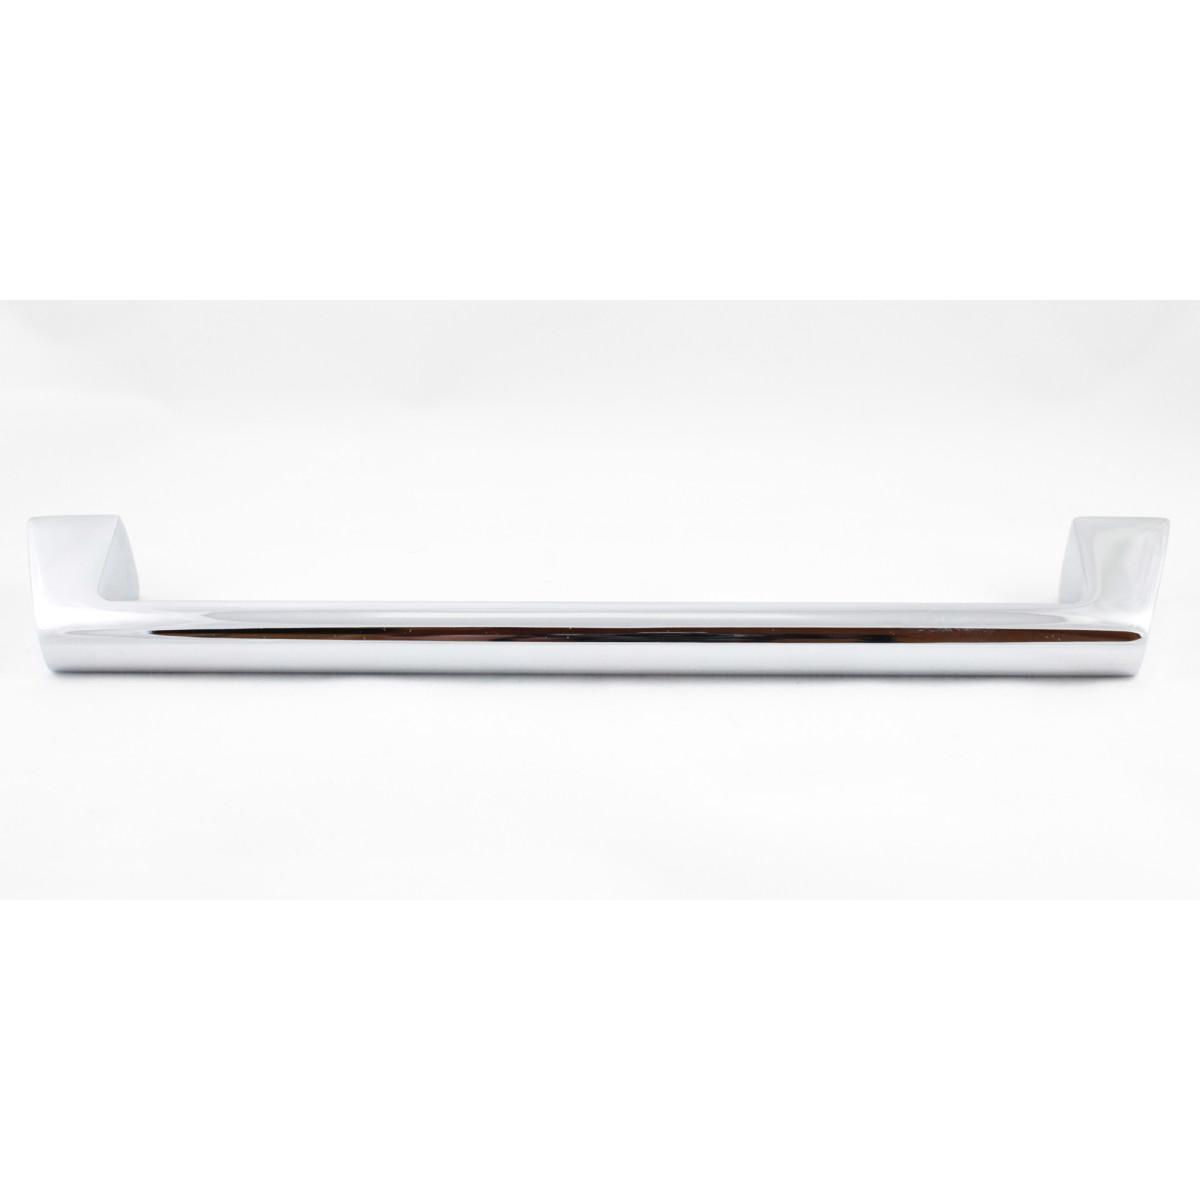 Ручка-Скоба Modda 320 Латунь Хром Diva-810-08-320